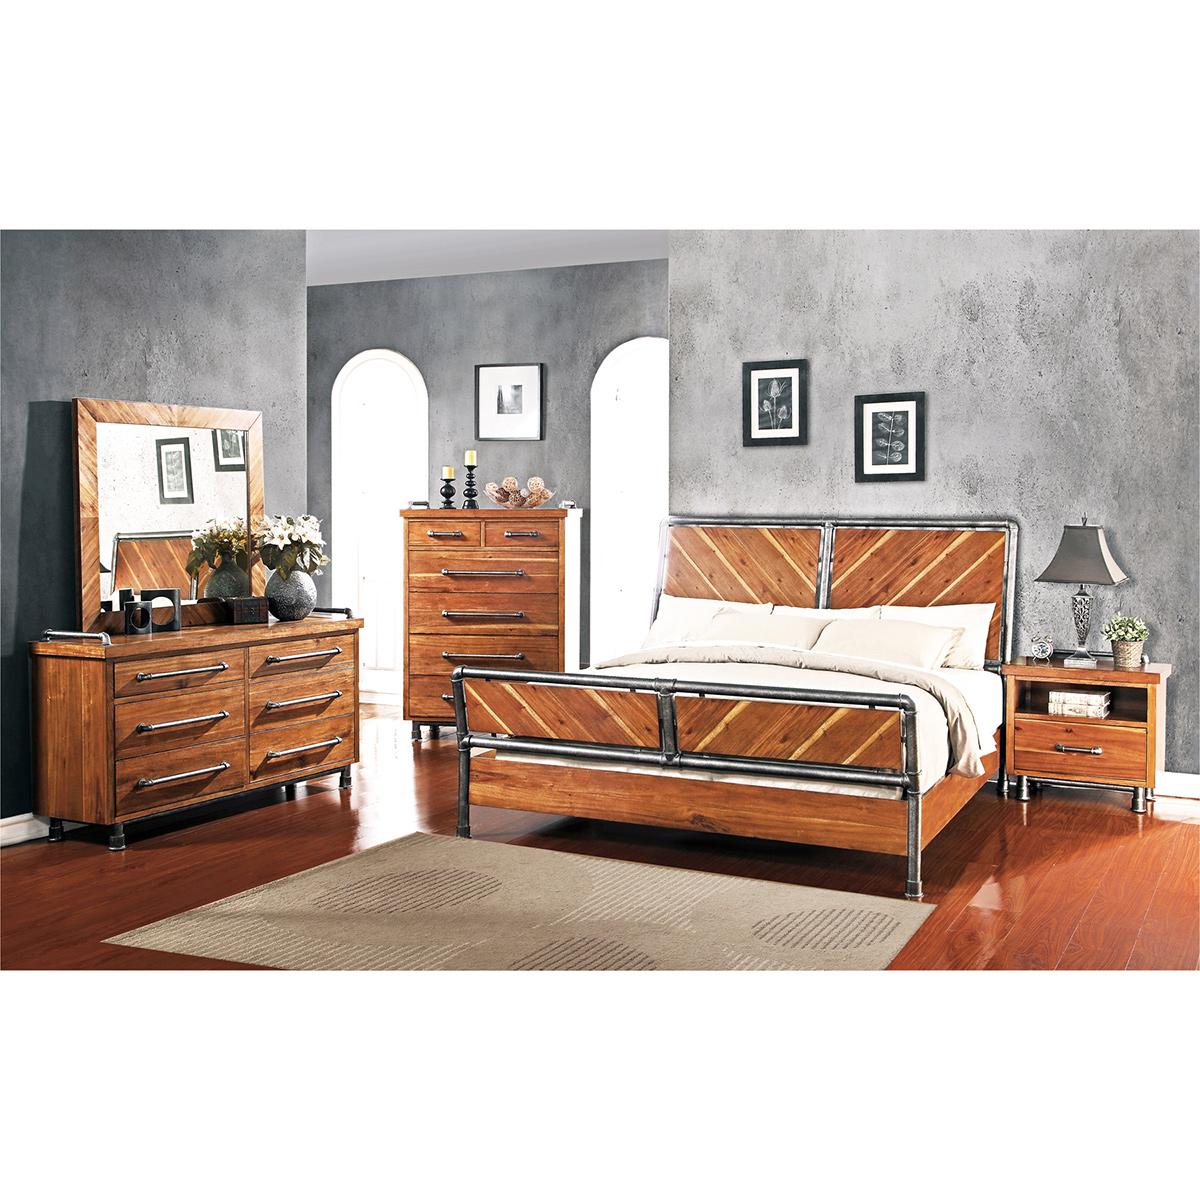 Legends Furniture ZSPK 7700 5PC KING Steampunk 5 Piece